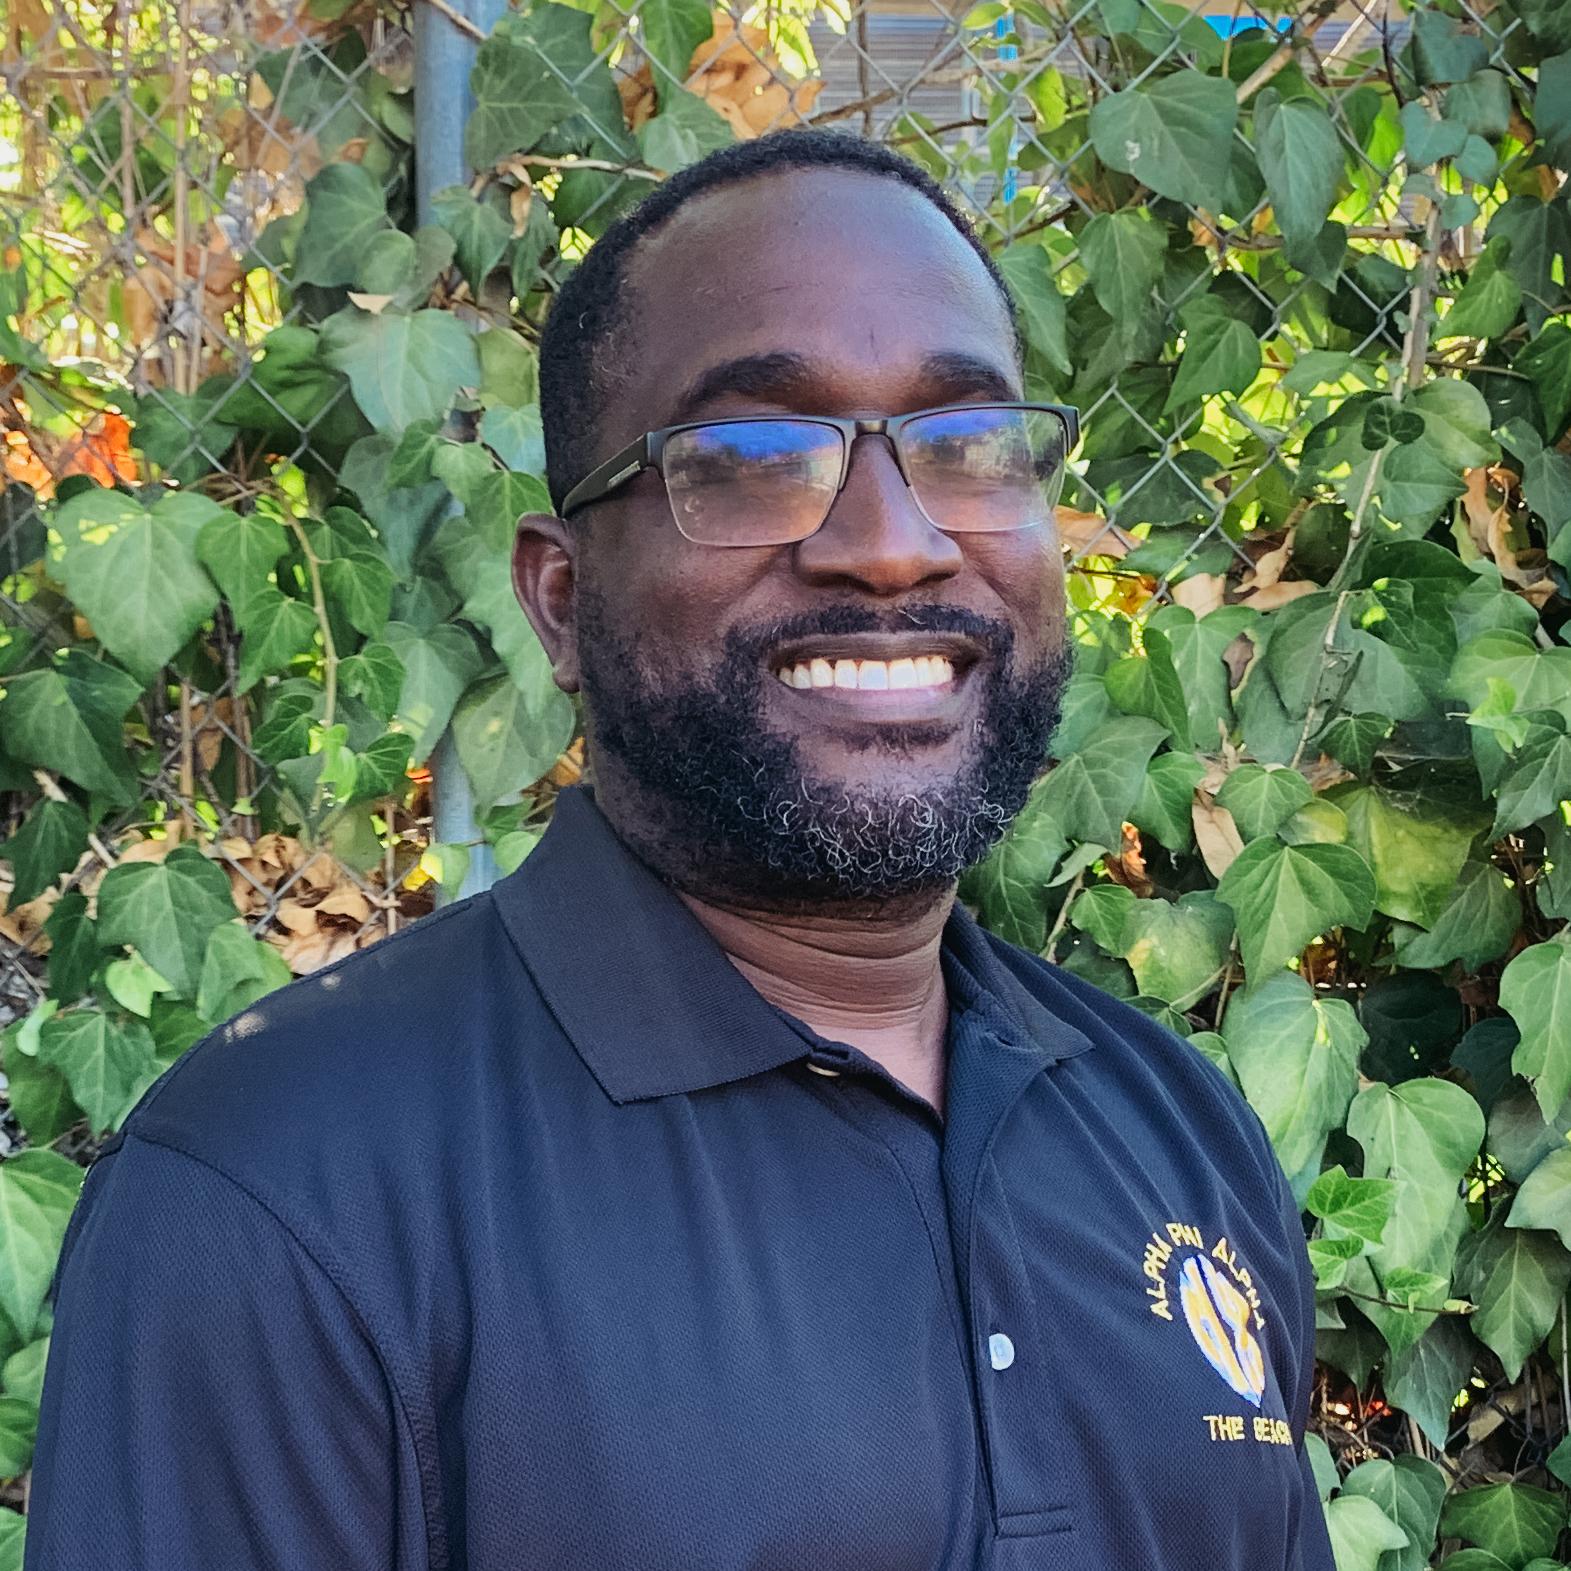 Peter Watts, host of The Black Church Still Speaks Podcast